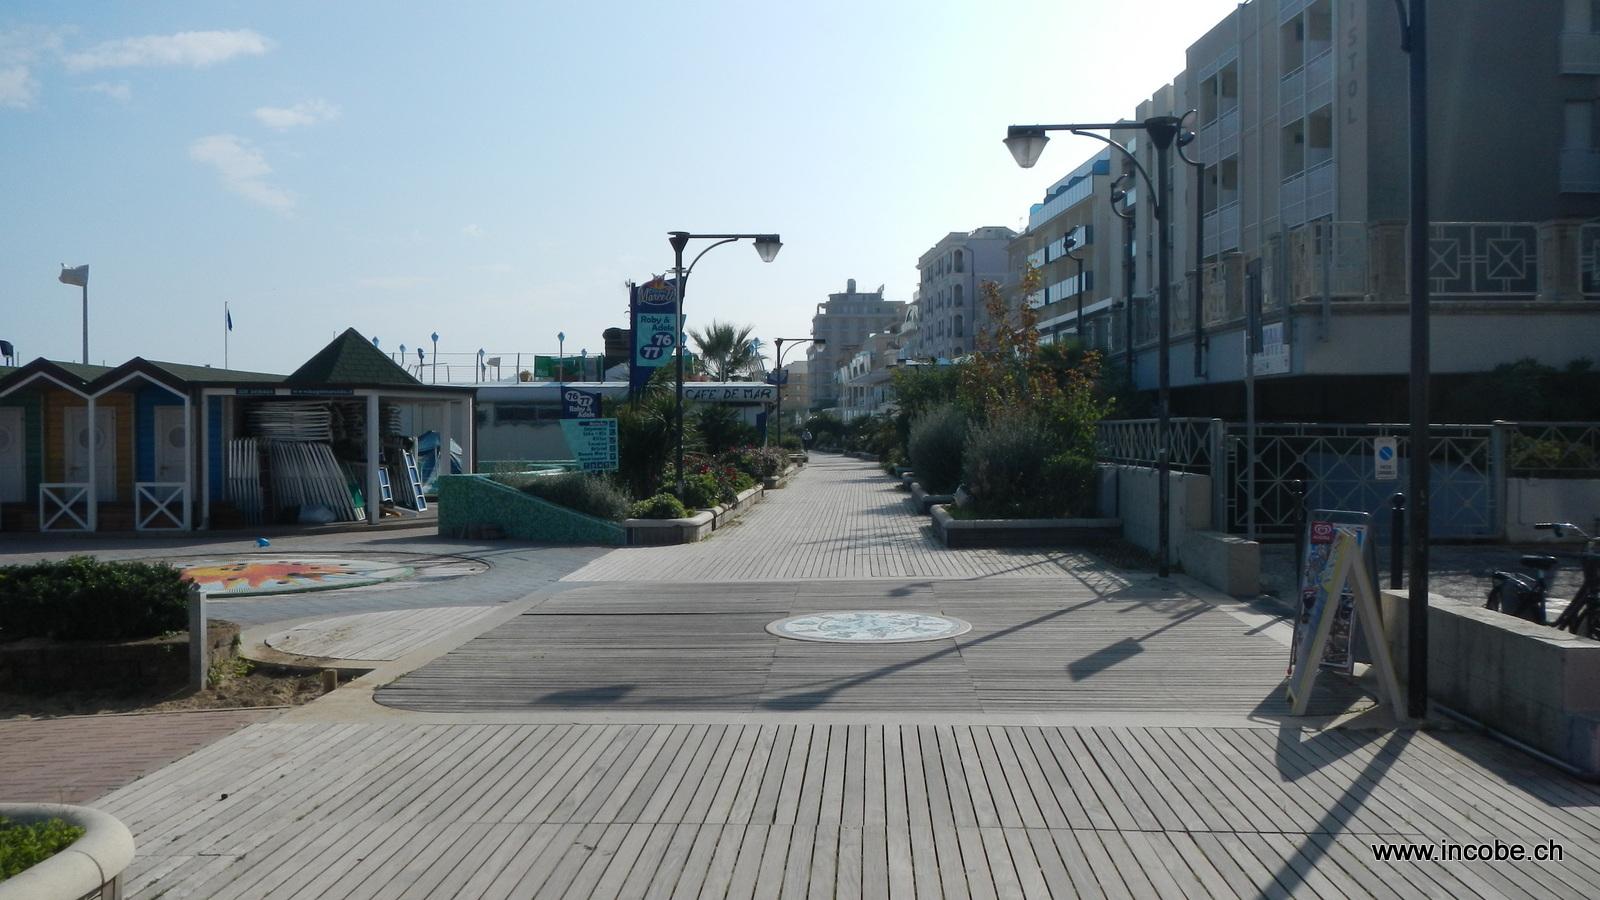 Strandweg in Gattolica